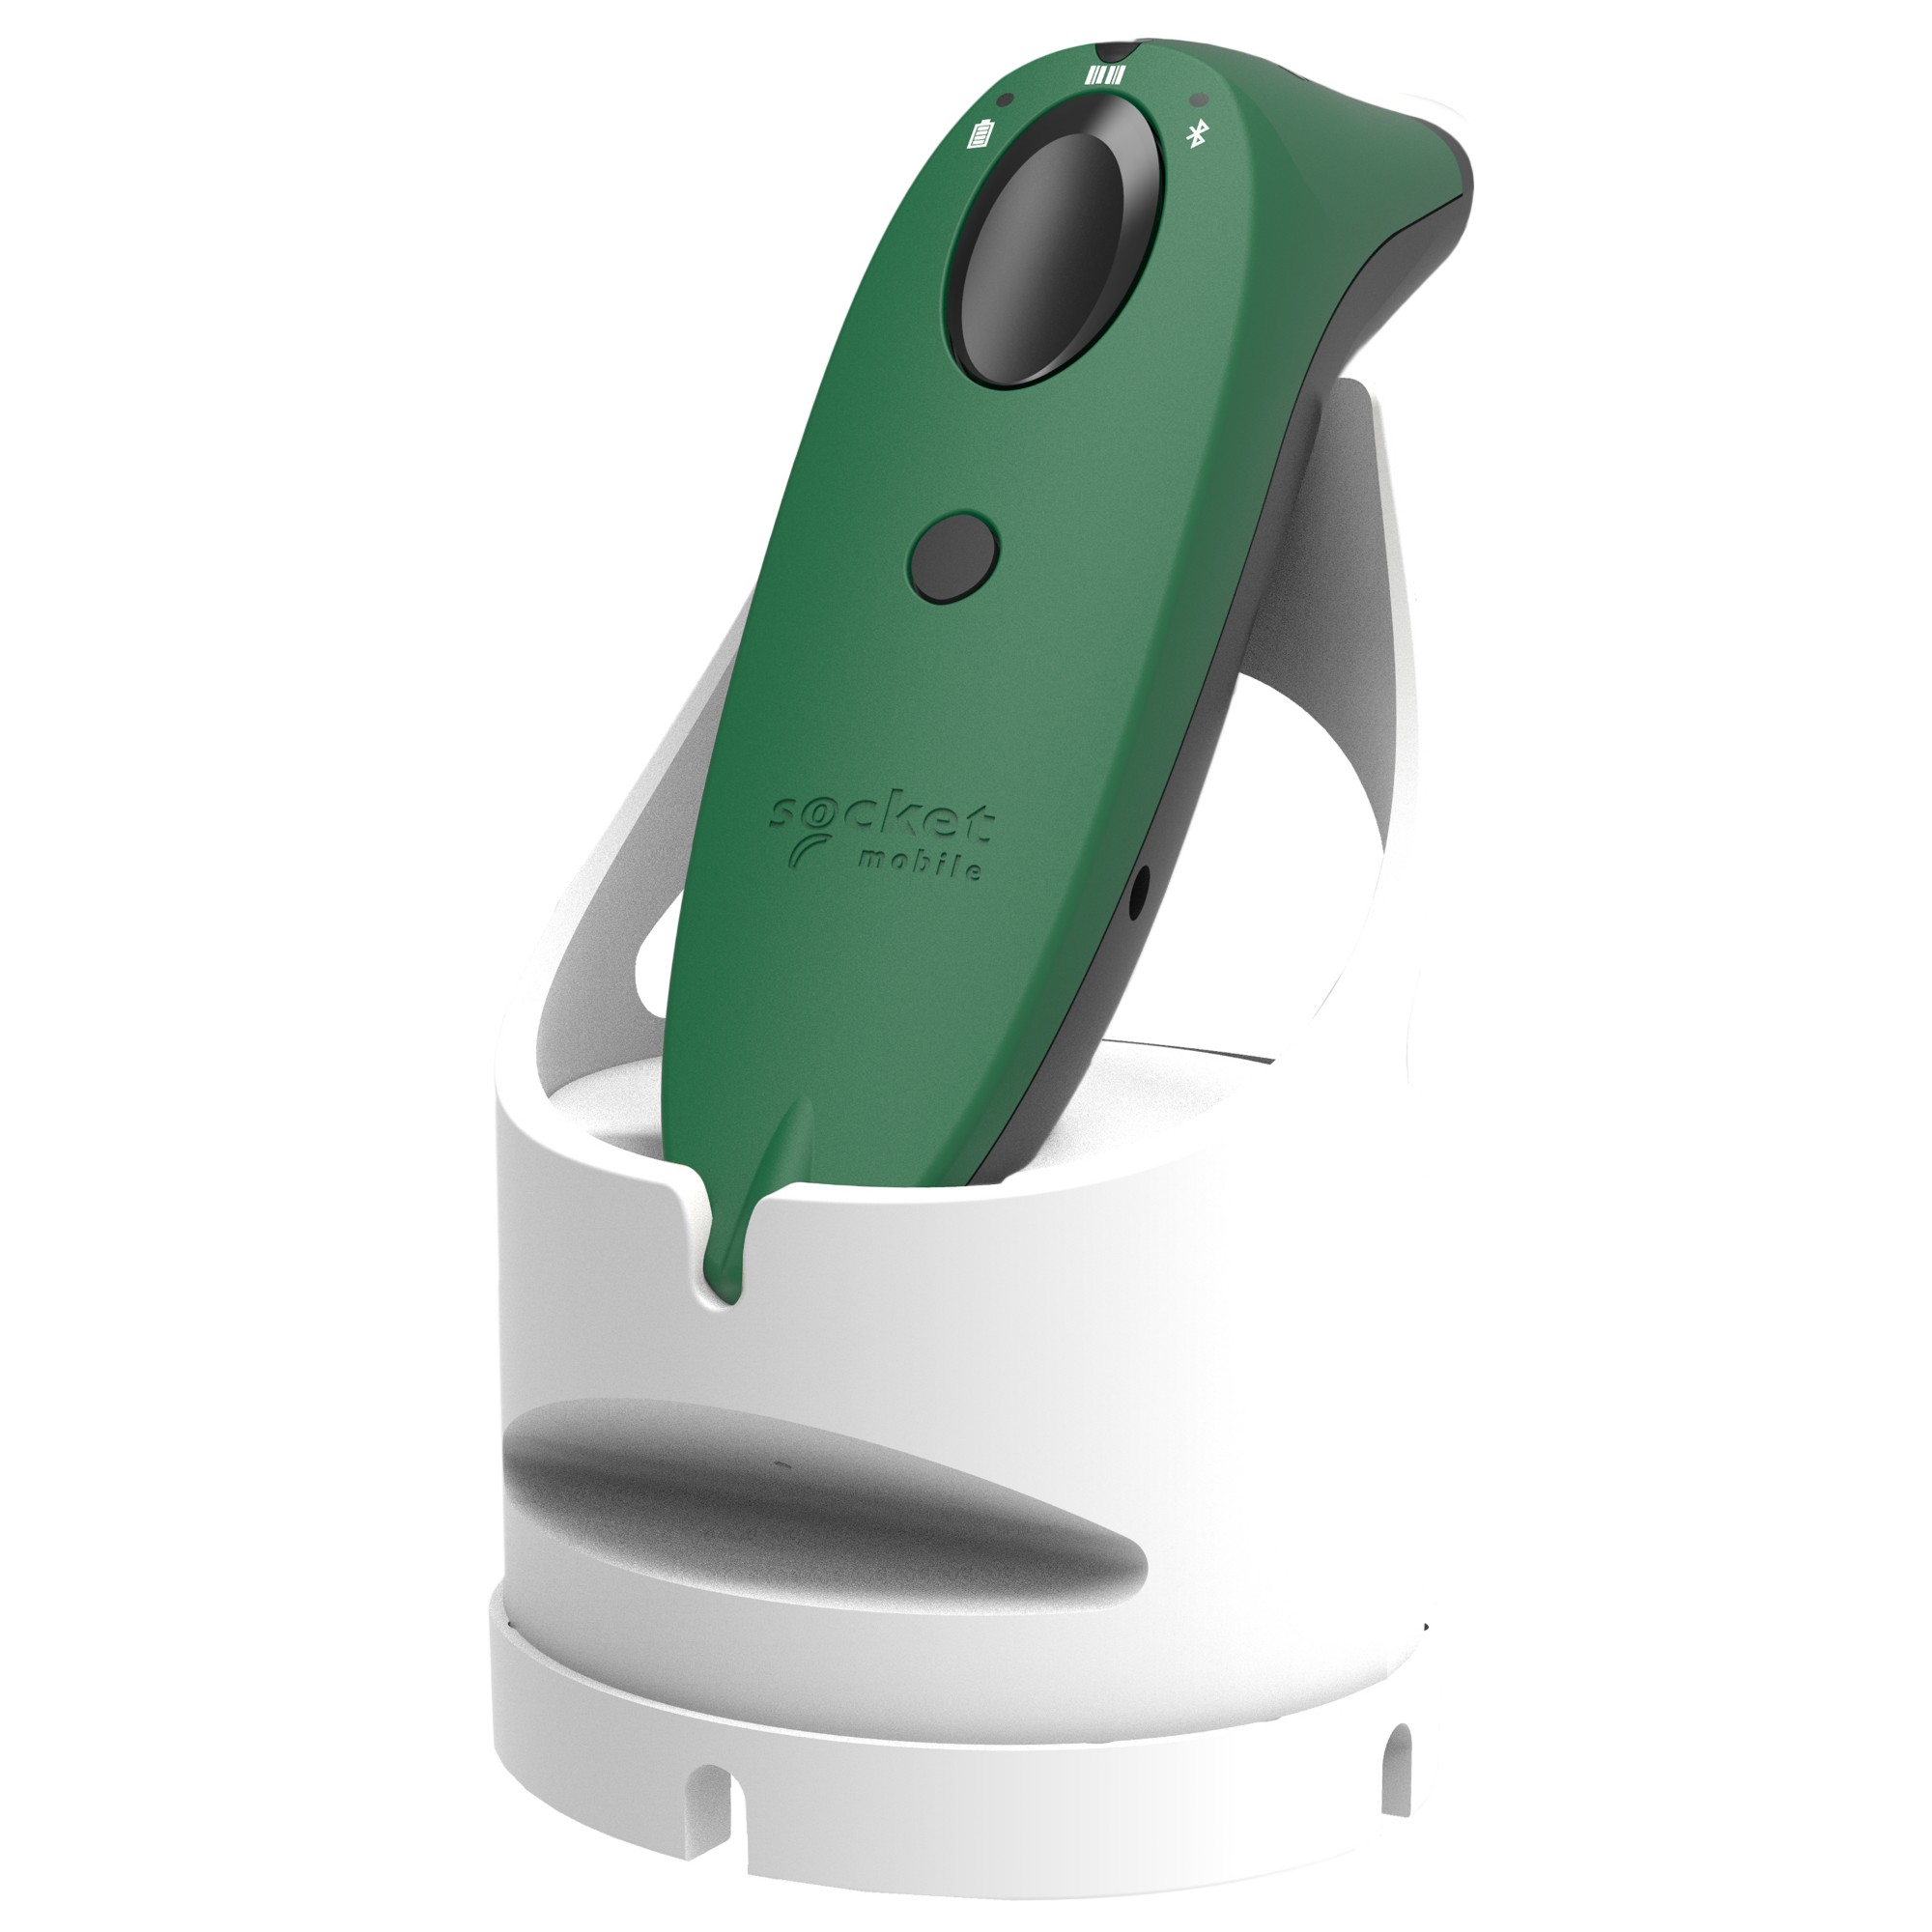 Socket Mobile SocketScan S740 Lector de códigos de barras portátil 1D/2D LED Verde, Blanco